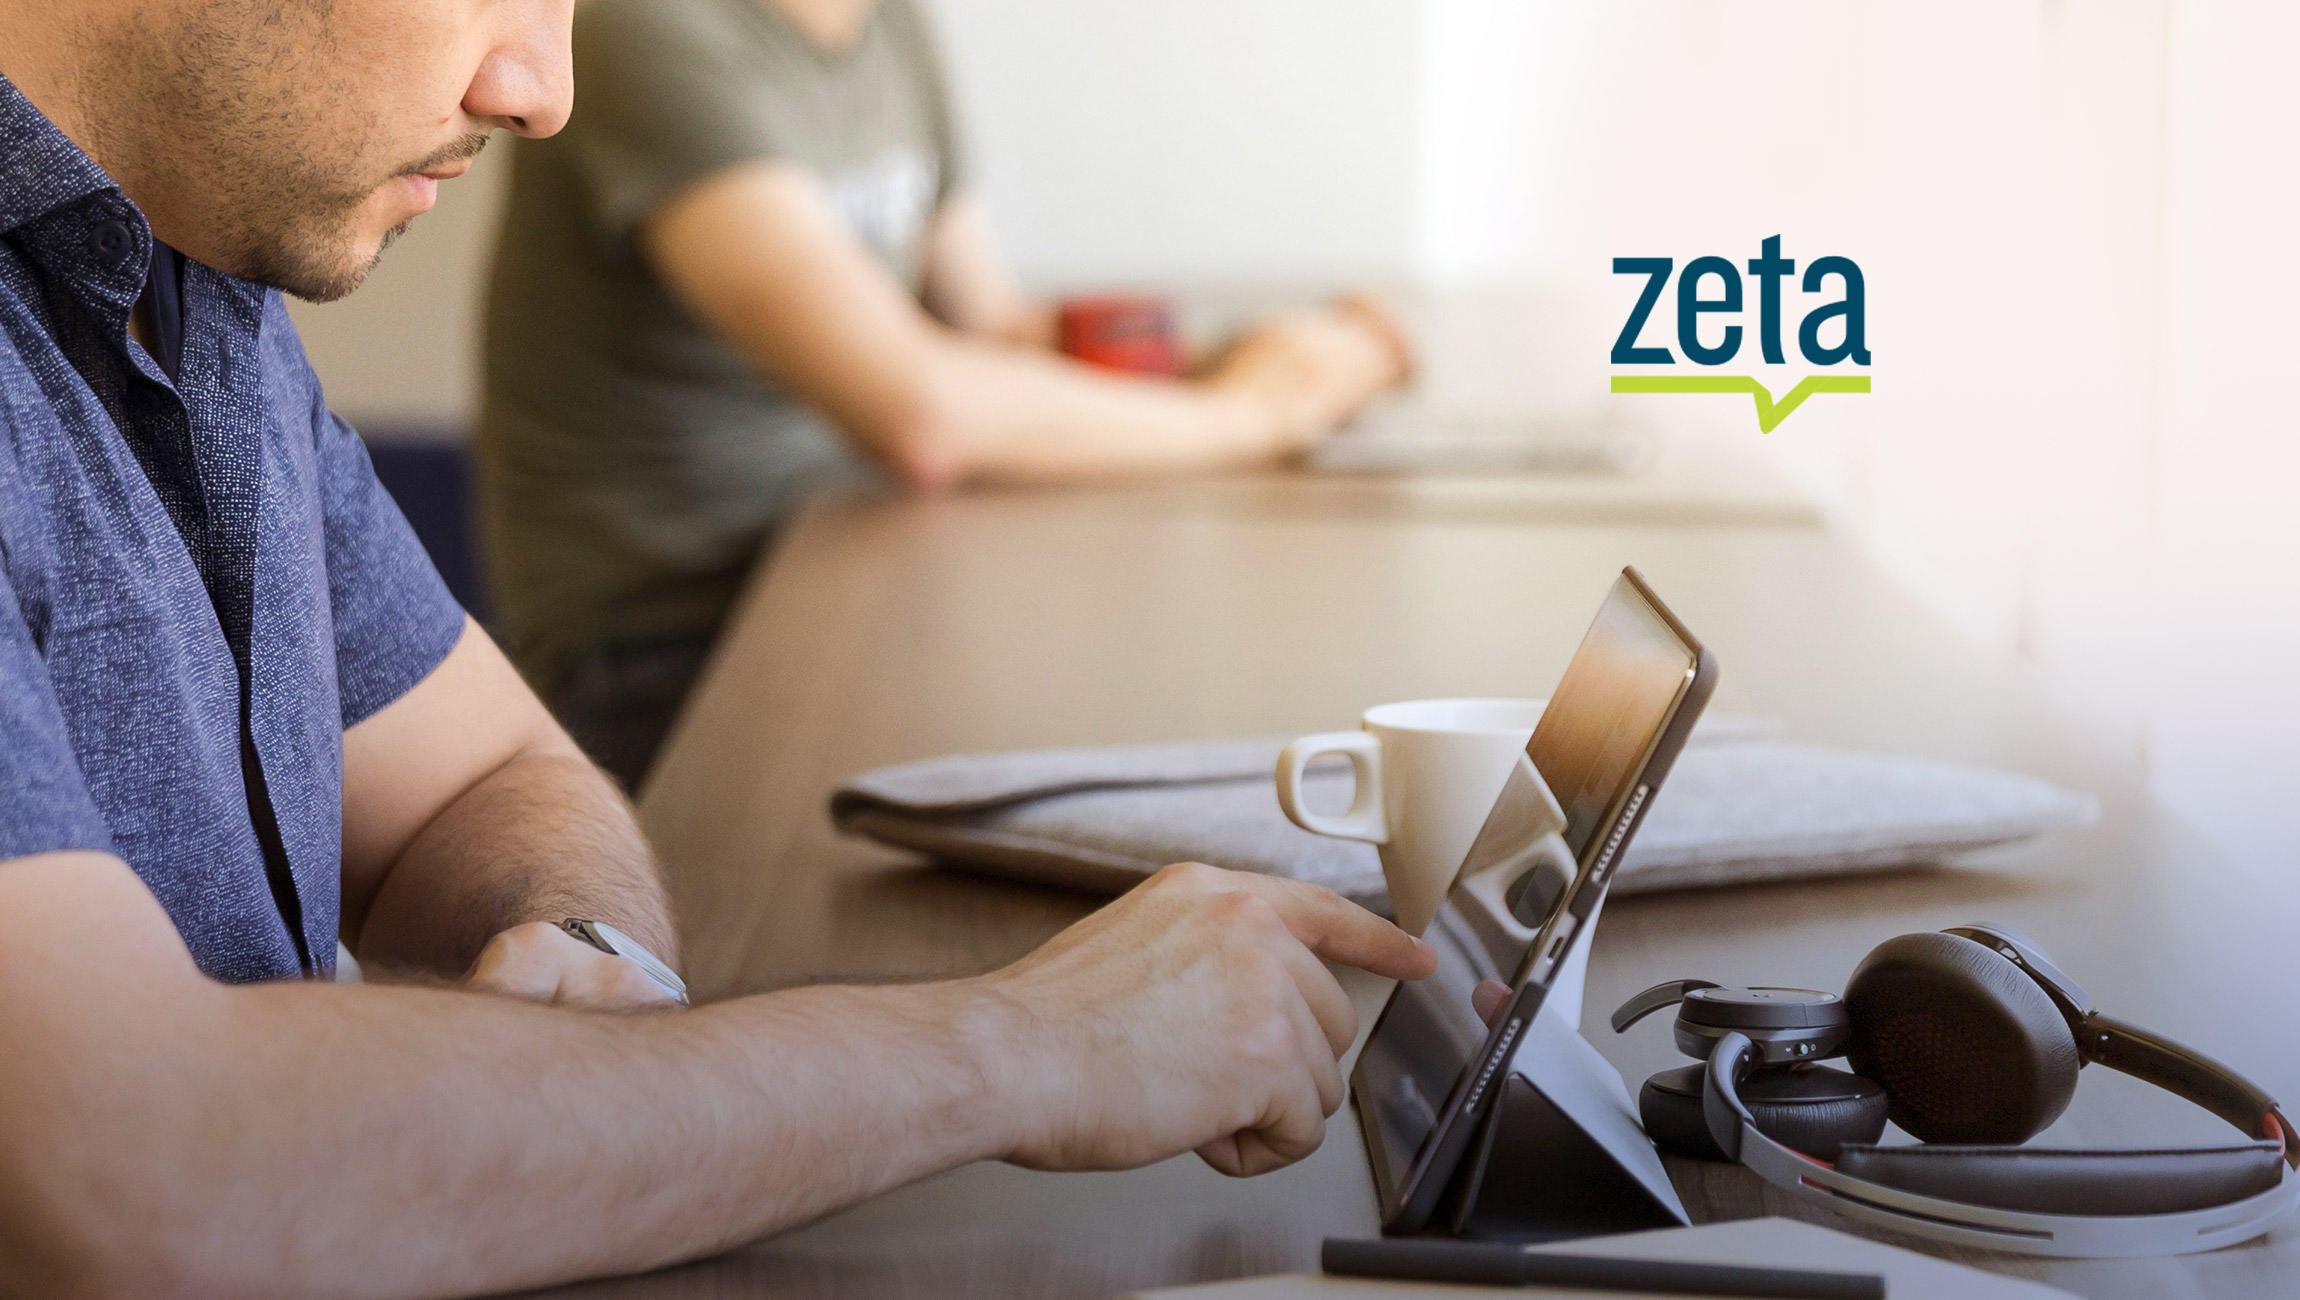 Zeta Global and PlaceIQ Announce Strategic Partnership to Enhance the Zeta Data Cloud